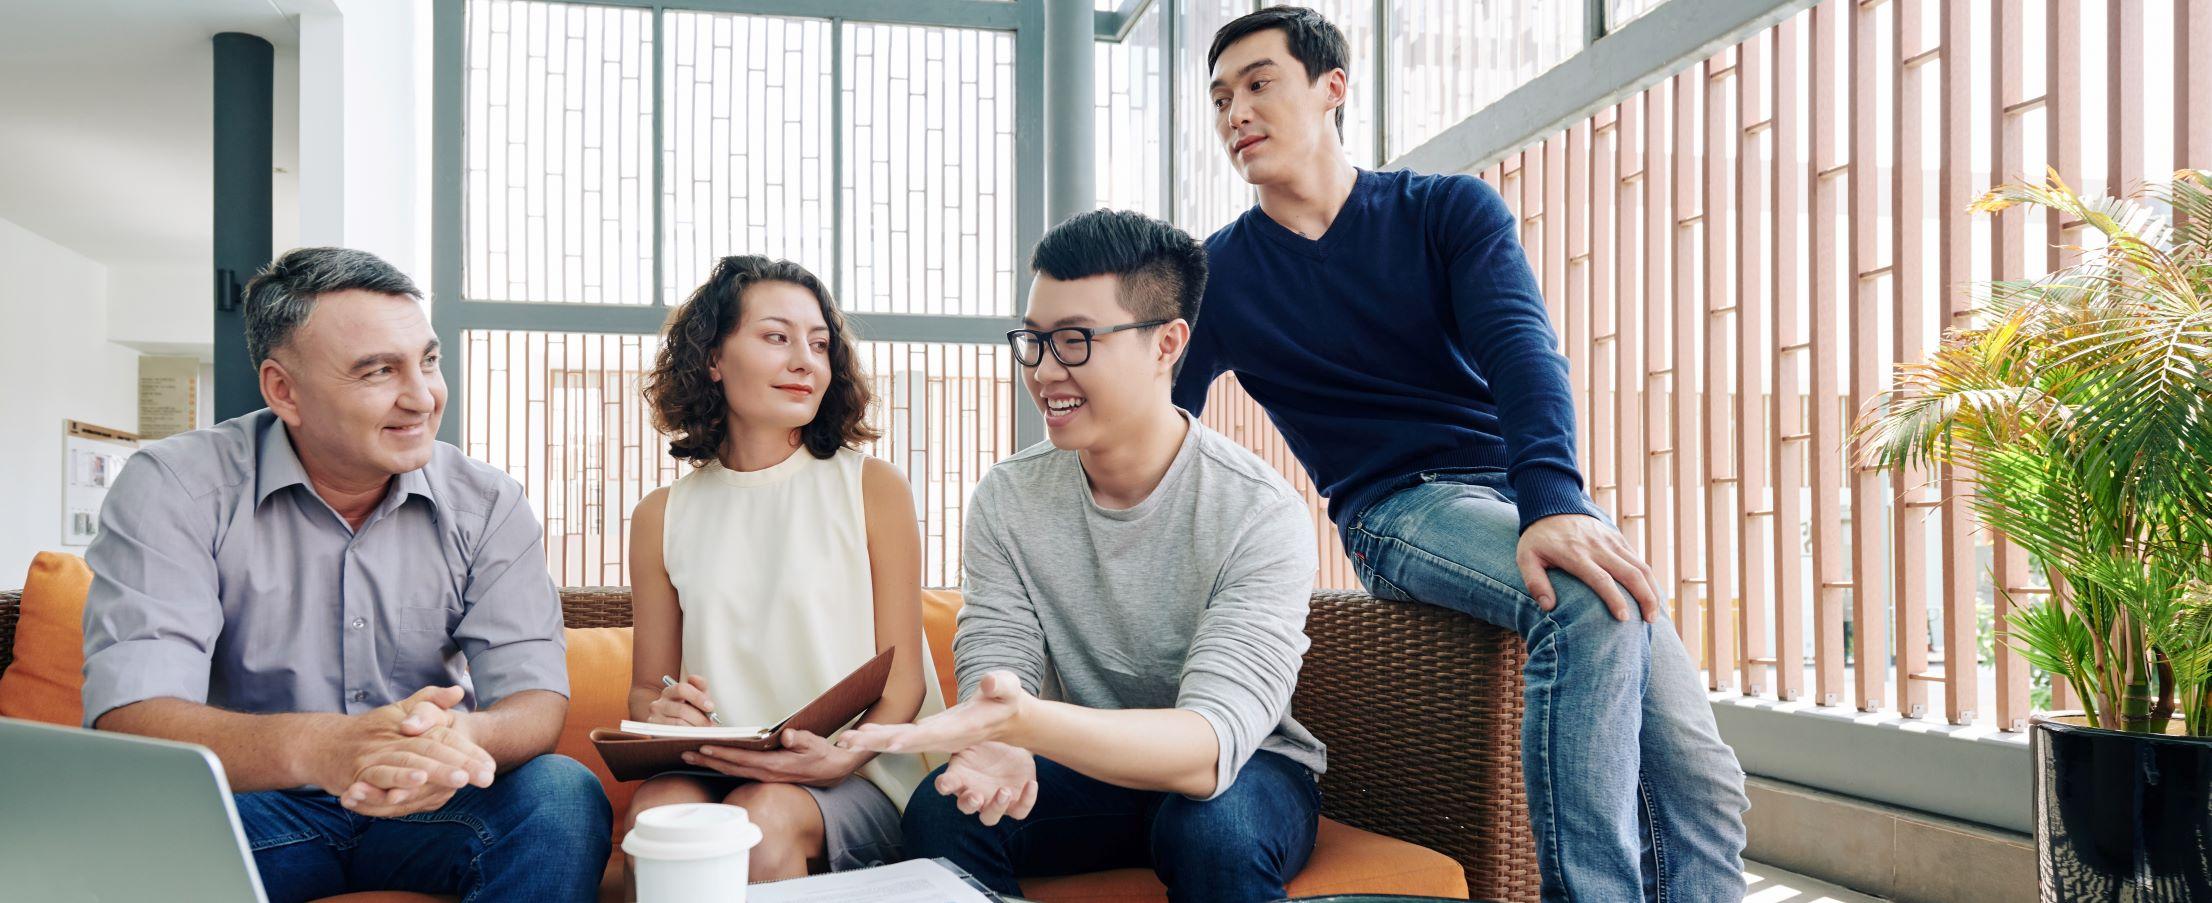 Is your workforce Restart Ready full